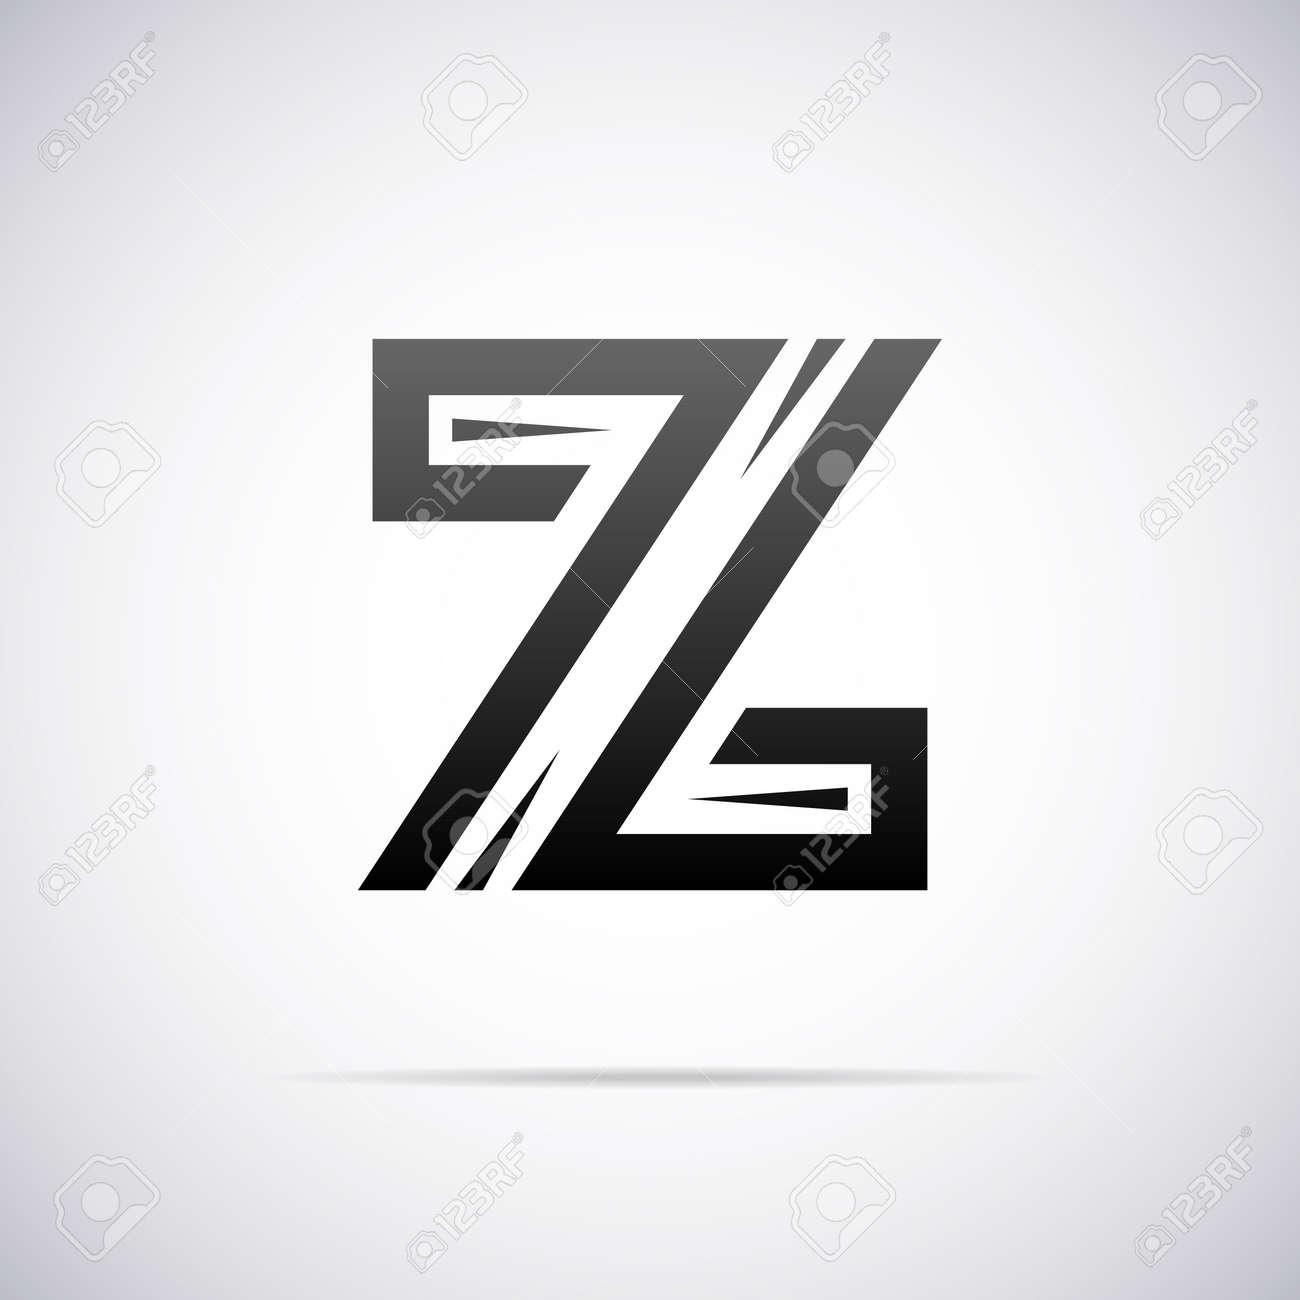 logo for letter z design template vector illustration royalty free